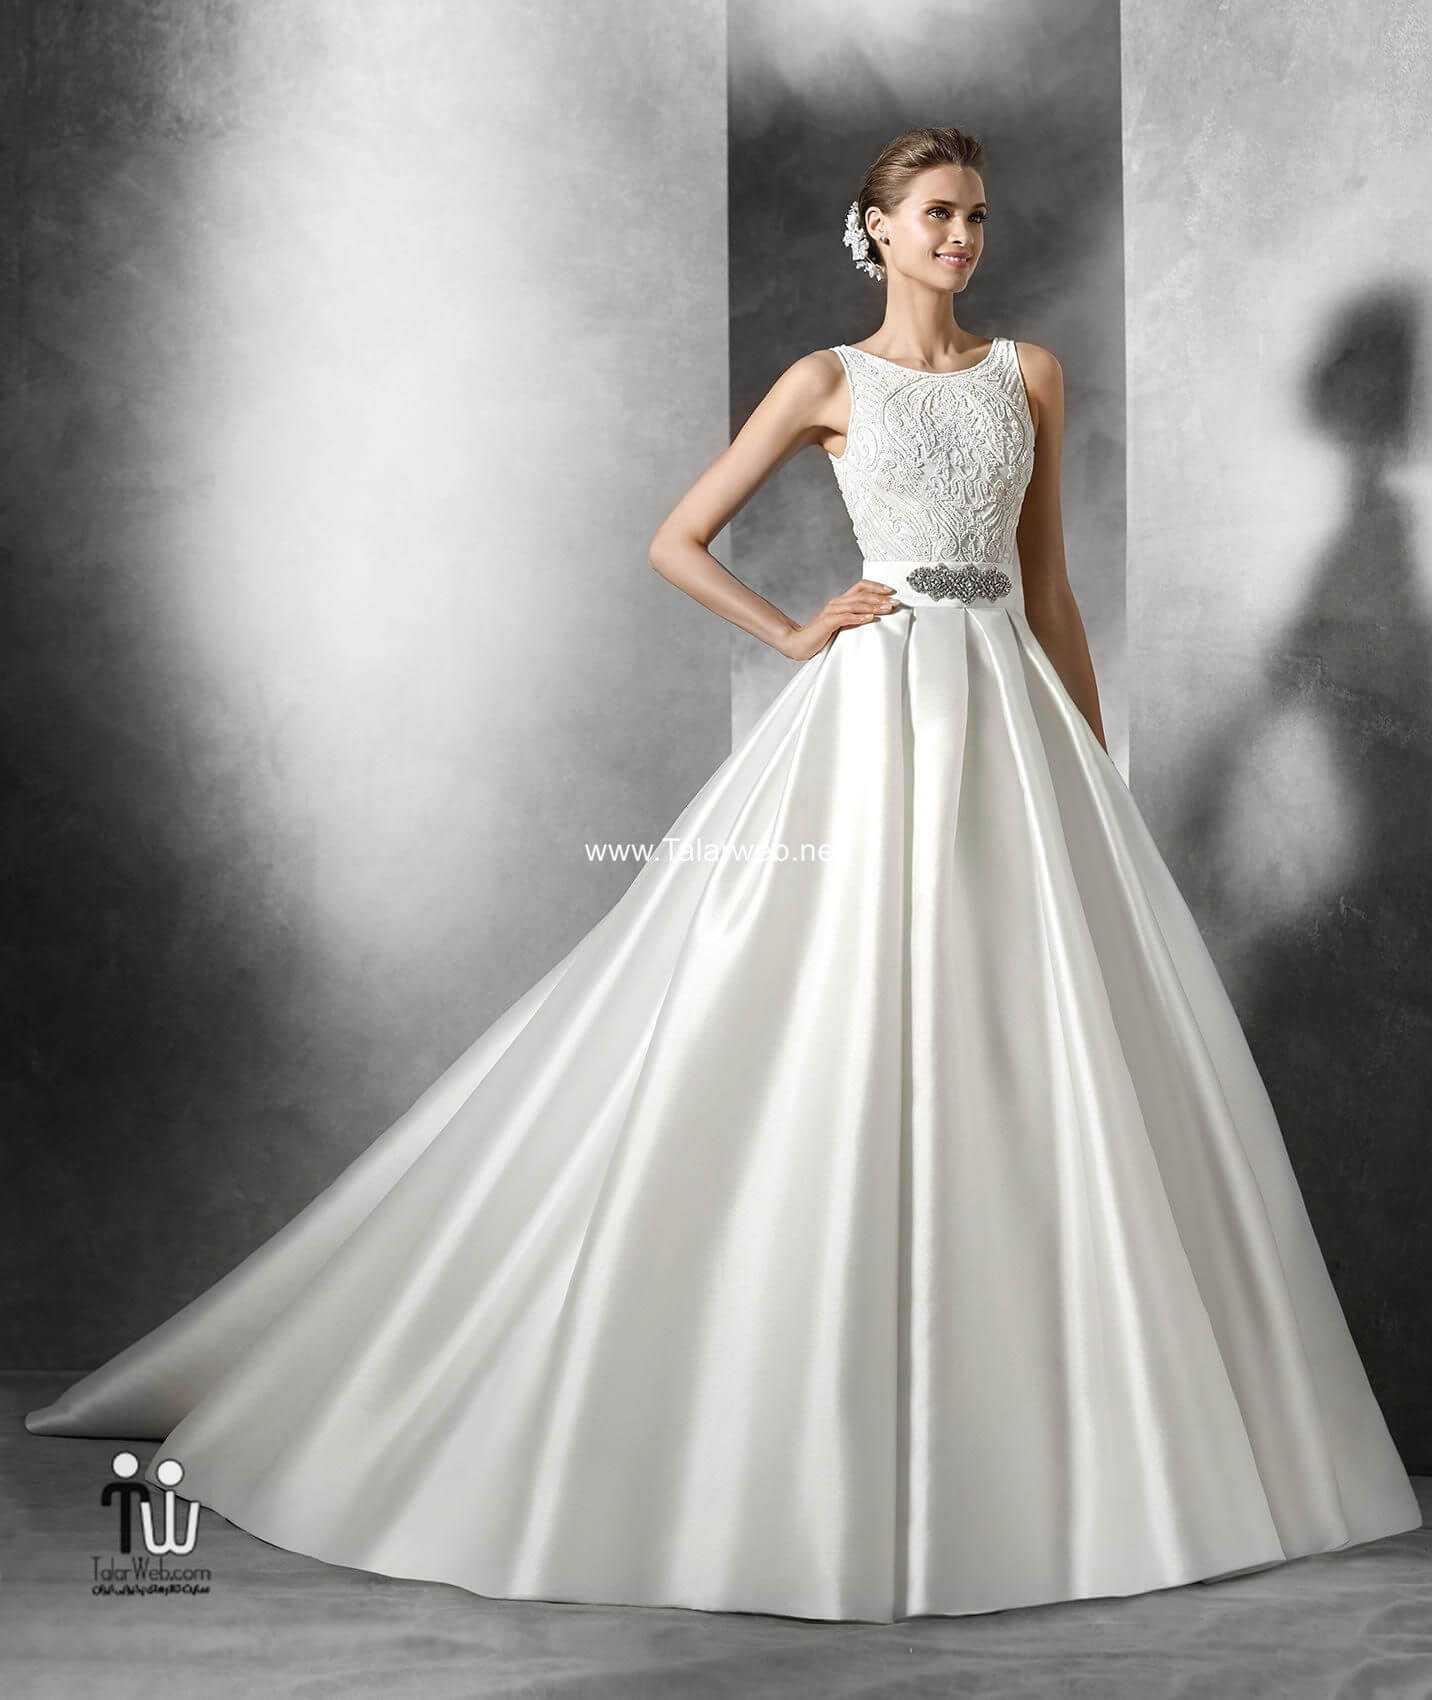 Wedding dresses bridal 2016 20 - مدل لباس عروس ۲۰۱۶ - سری۱